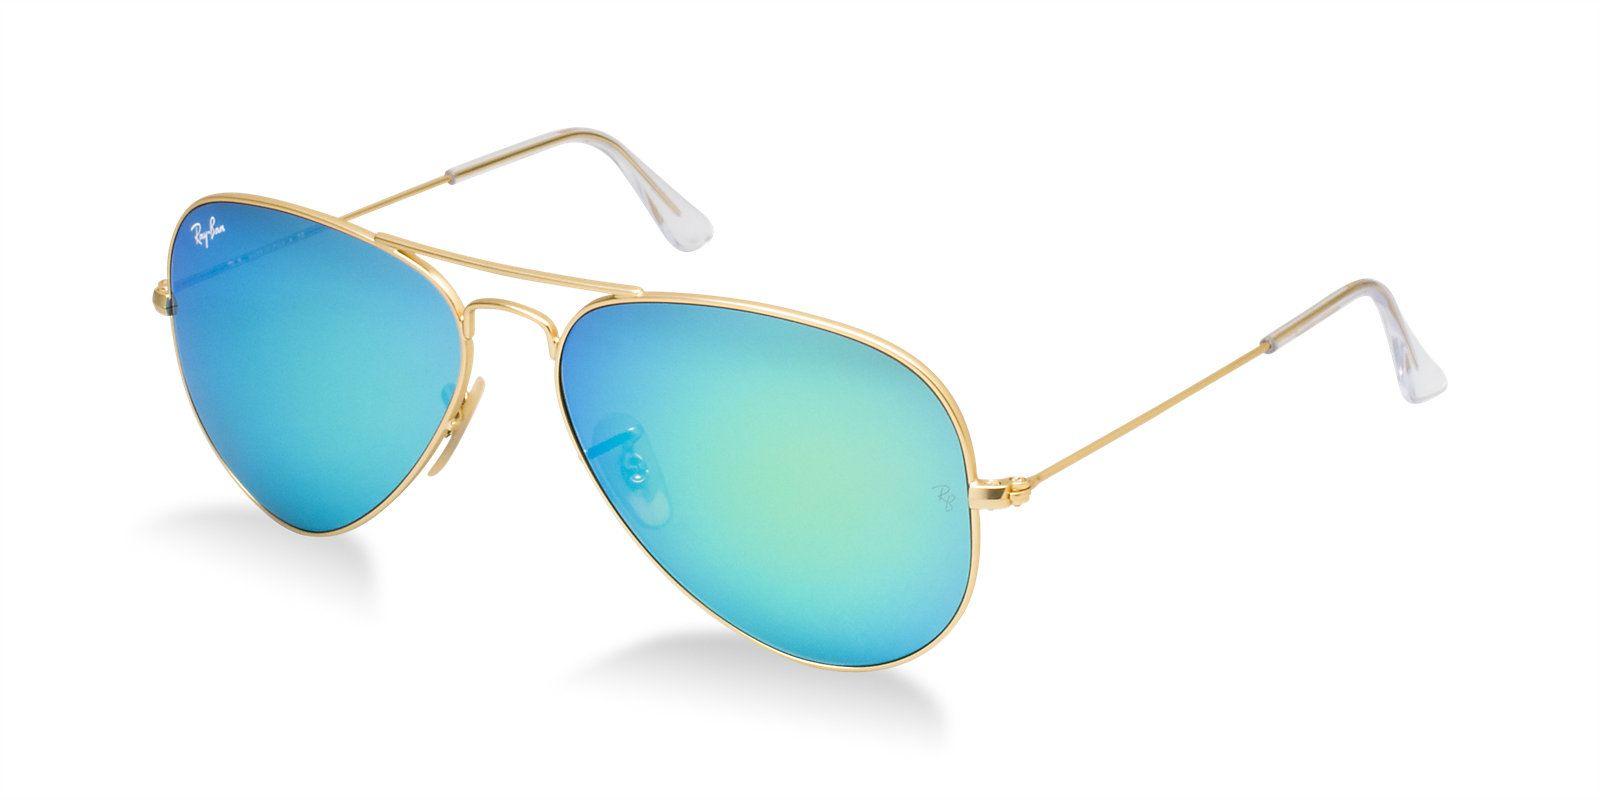 ray ban sunglasses sunglasses hut